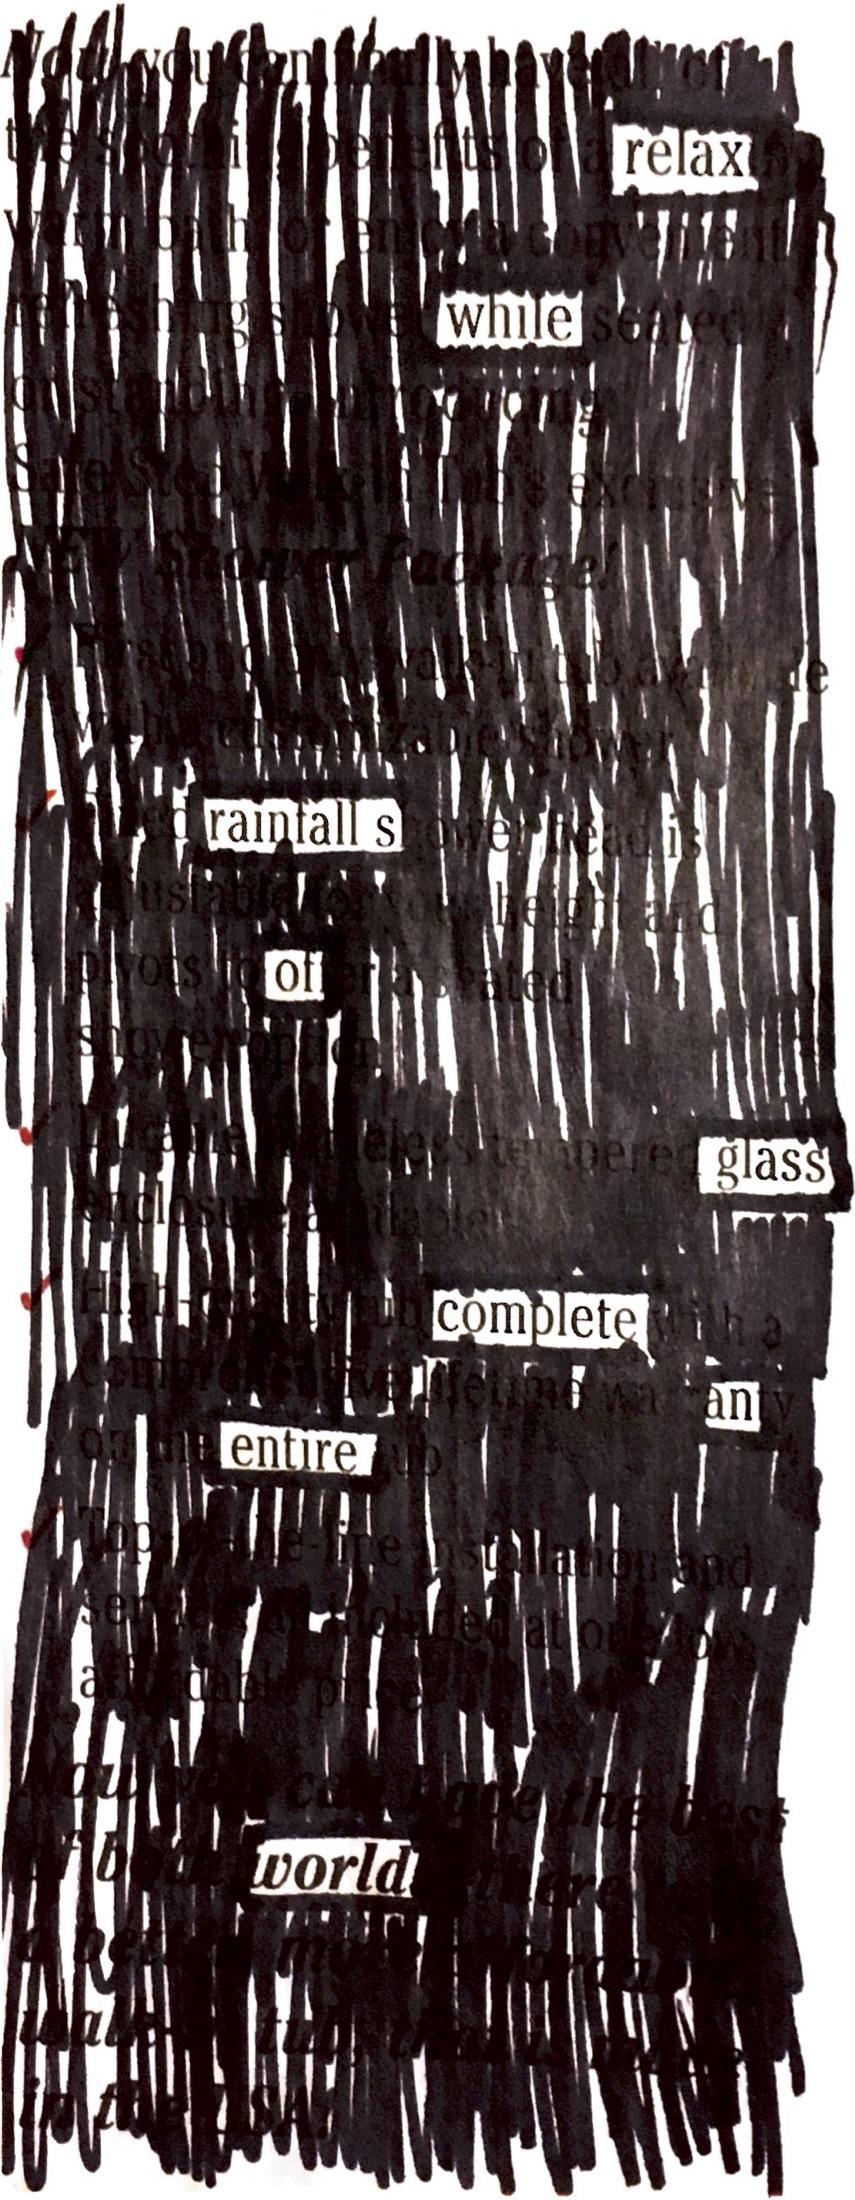 blackout poem.jpg